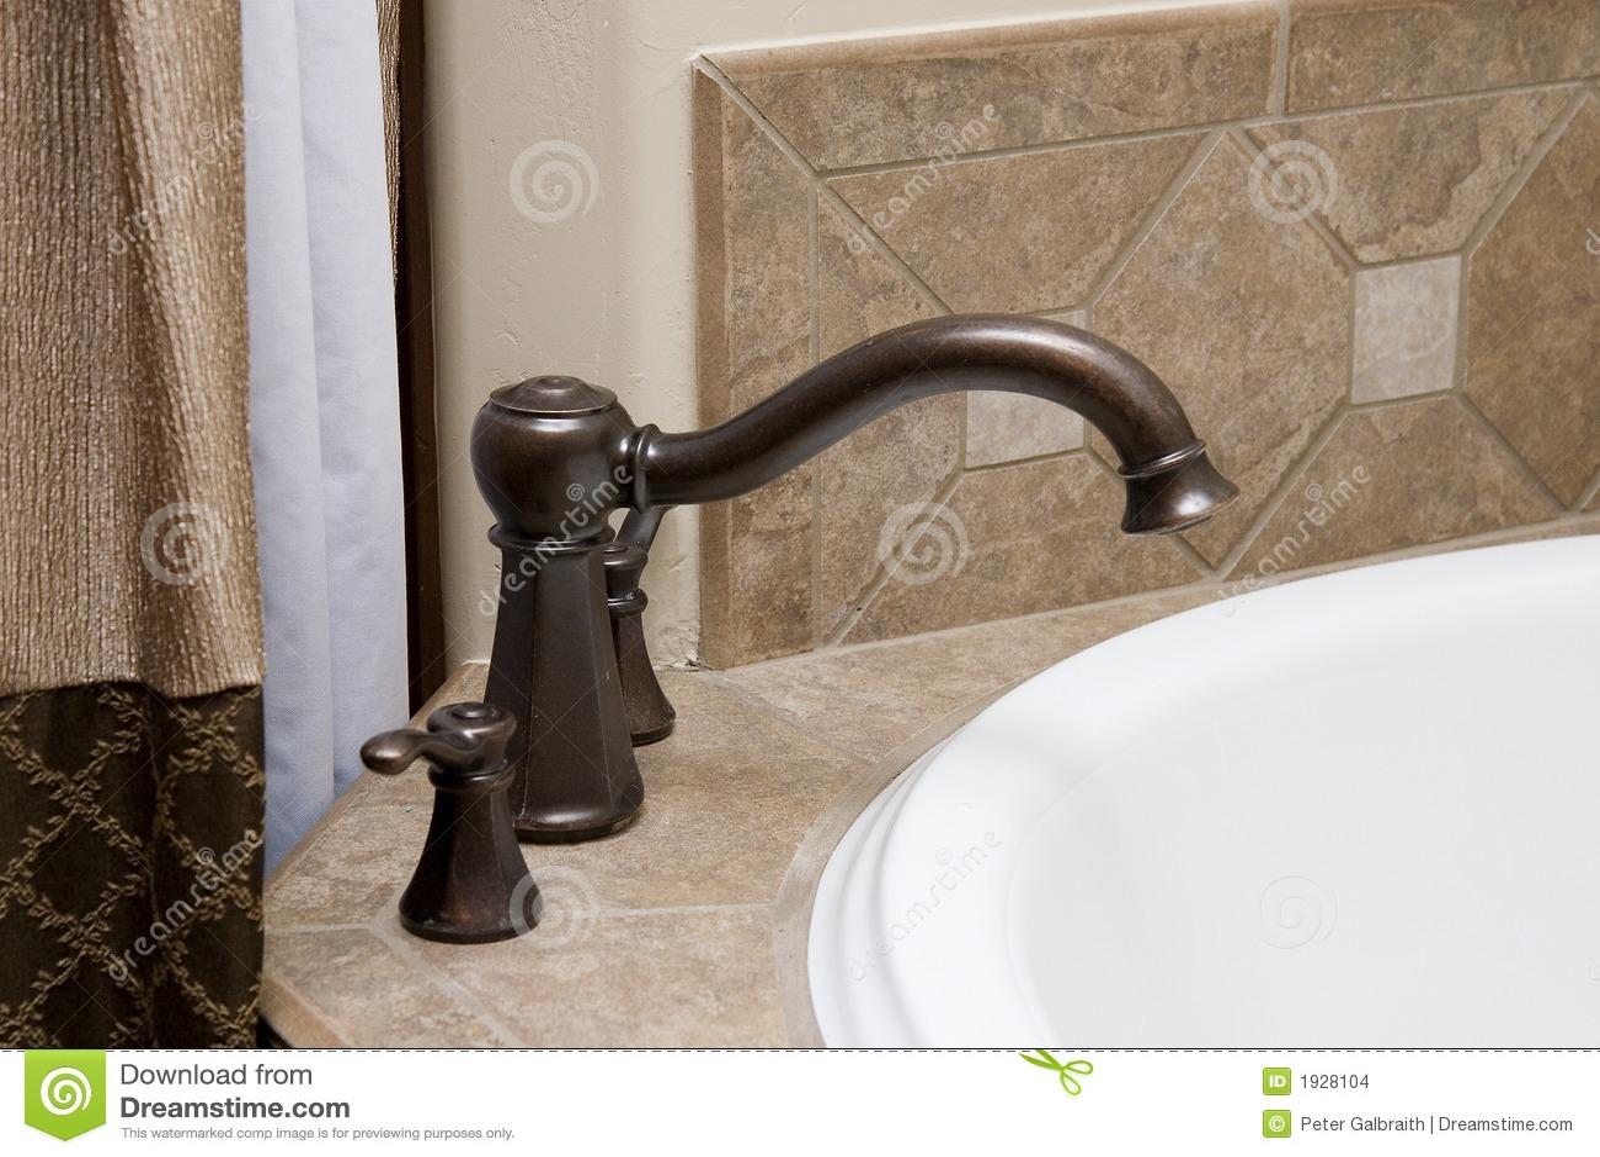 Fancy faucet stock images image 1928104 - Fancy bathroom faucets ...